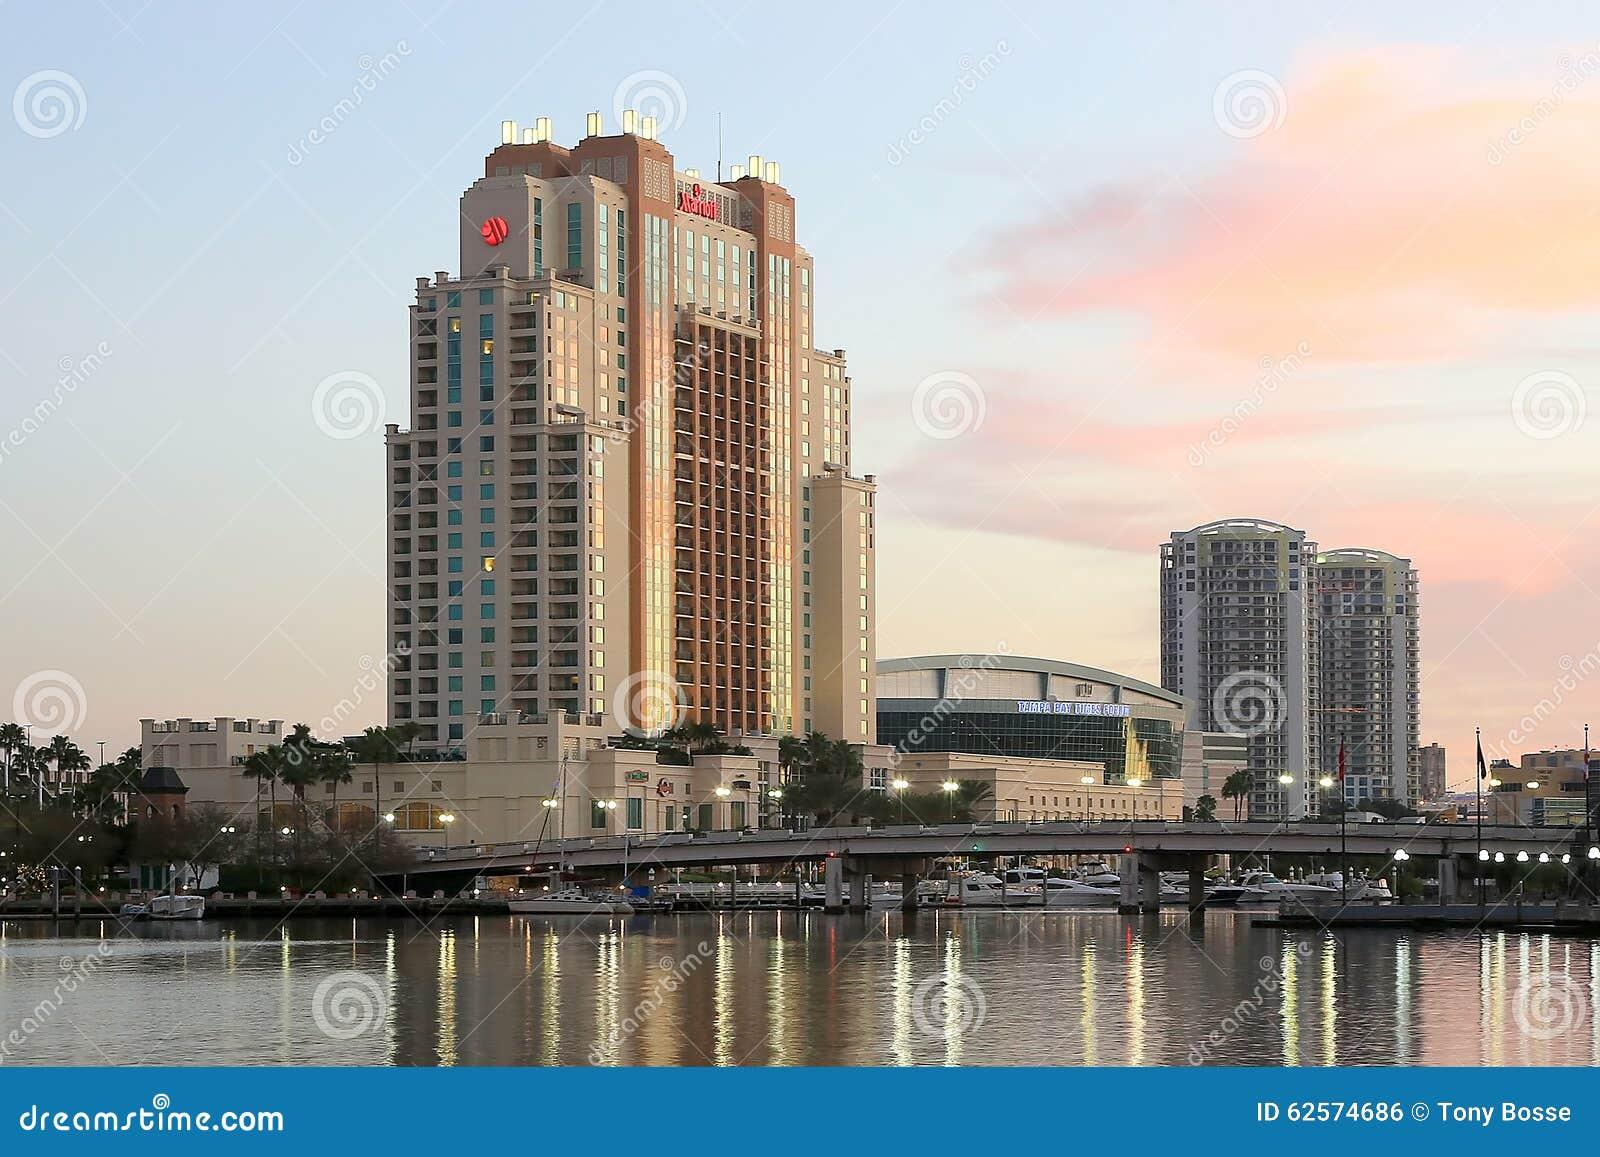 Marriott hotel W Tampa